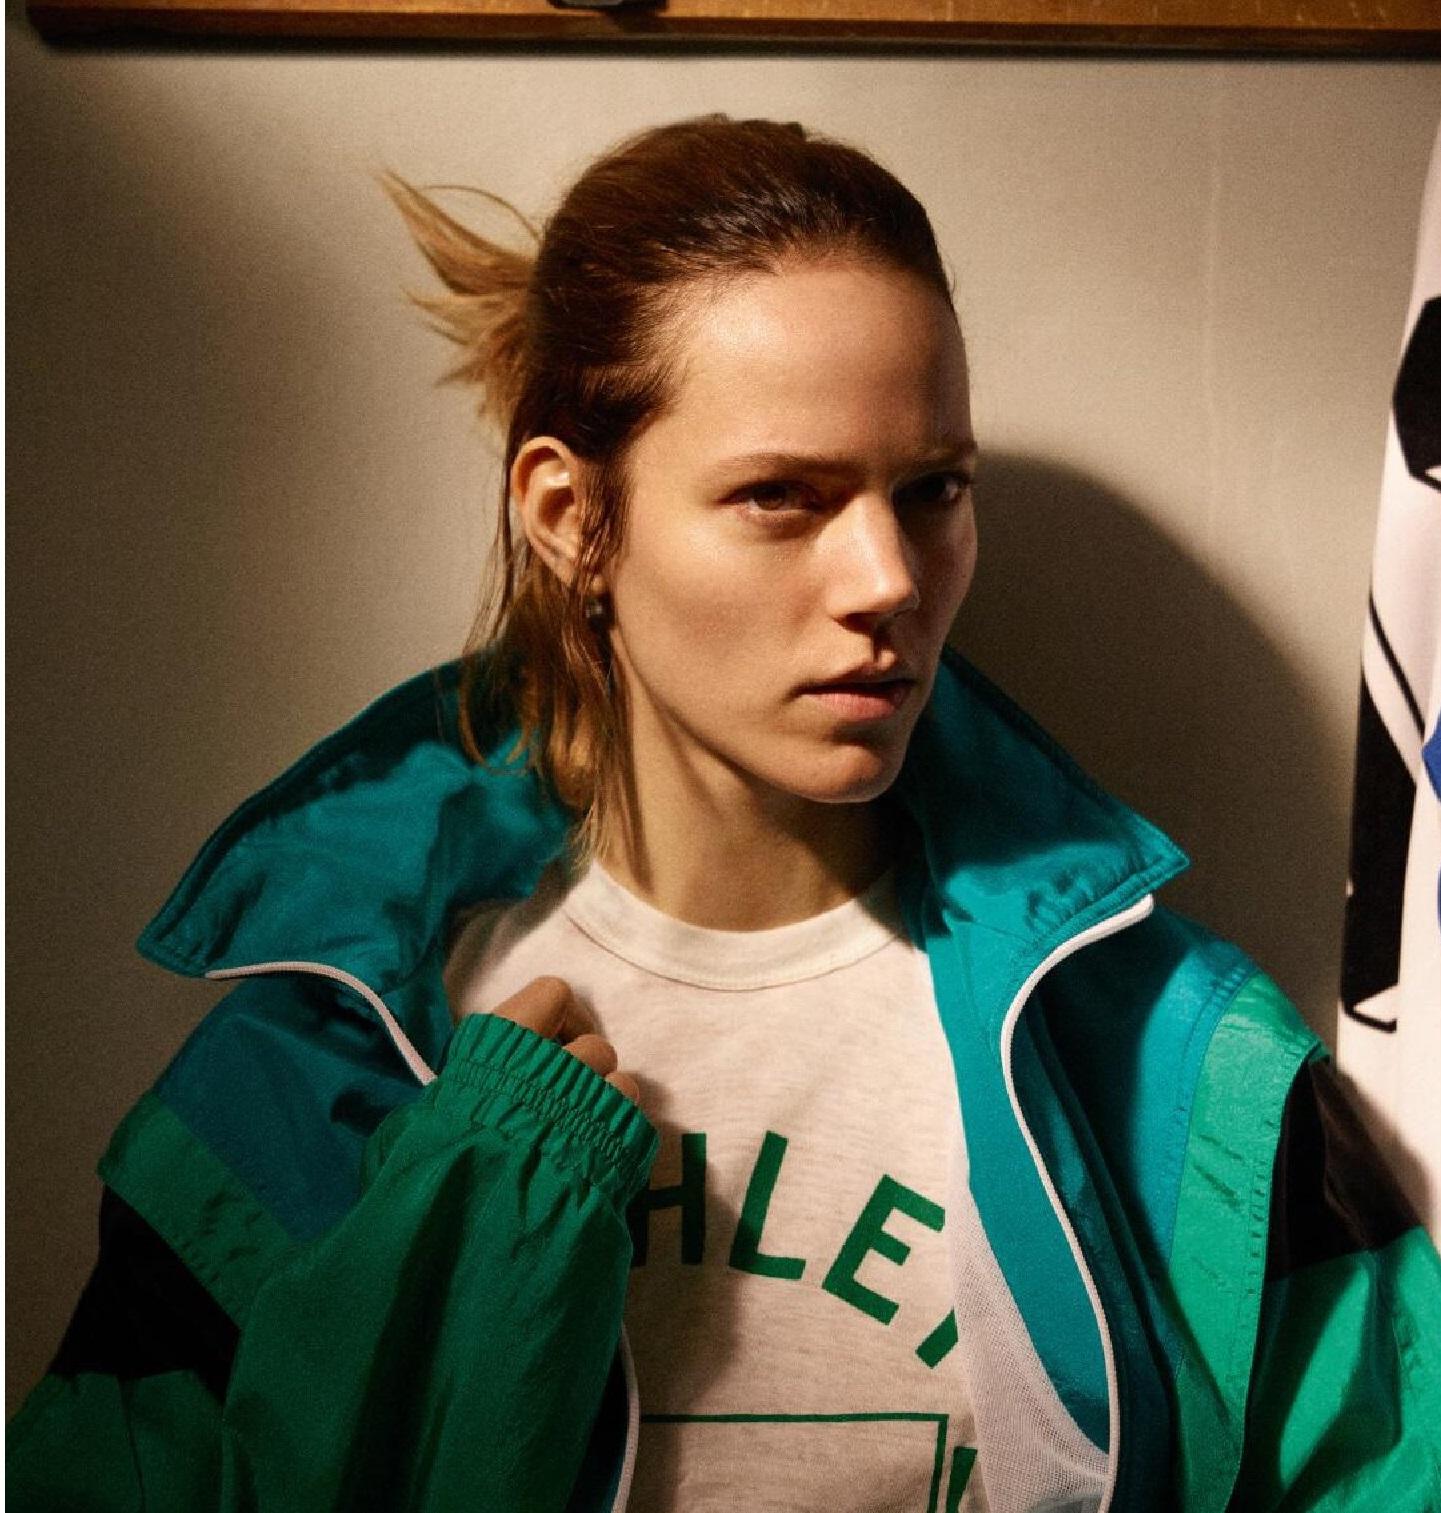 Freja Beha Erichsen by Karim Sadli for Vogue Paris JJ2019 (12).jpg